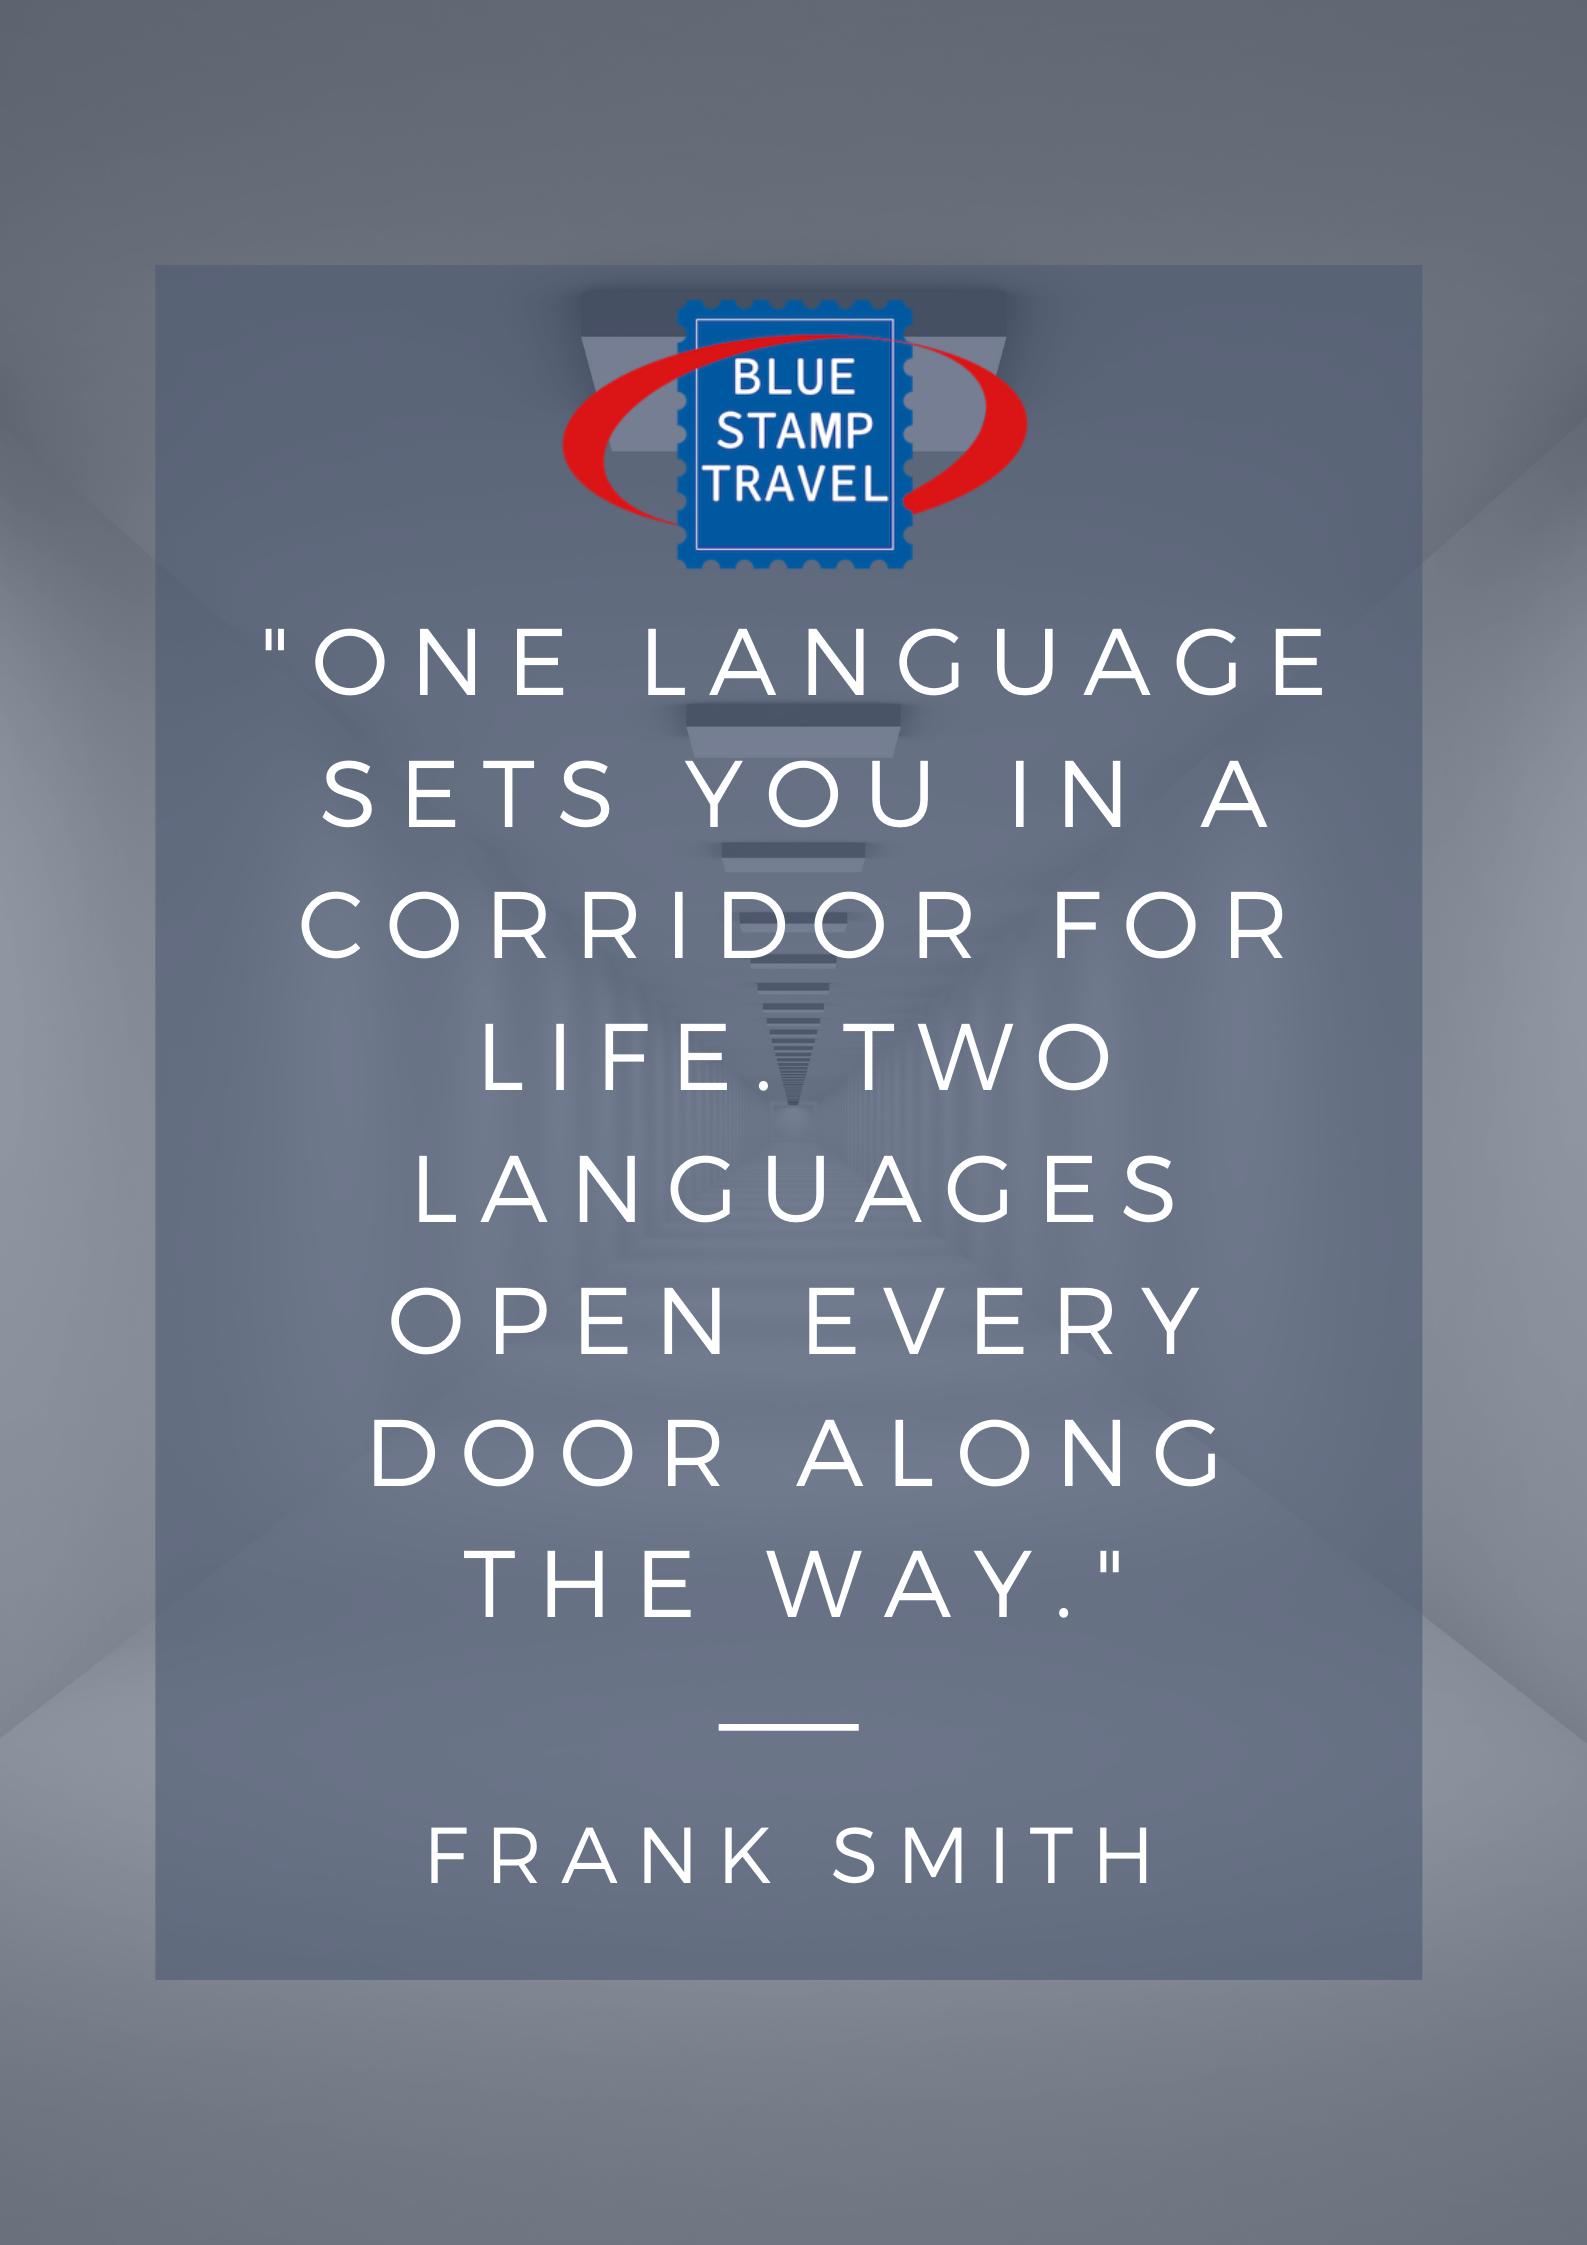 Languages Quote Poster